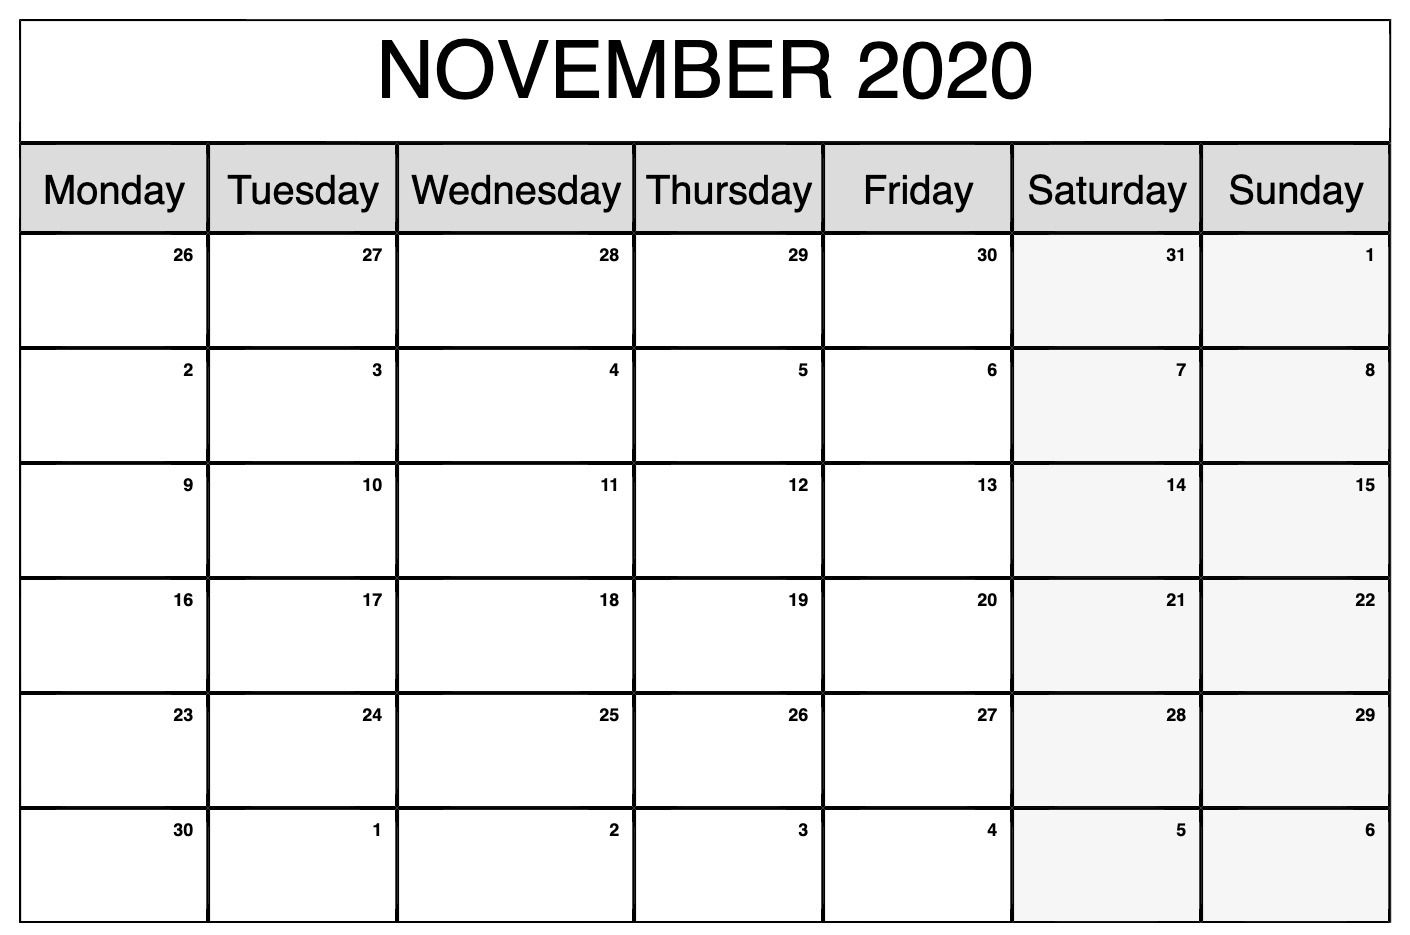 Printable November 2020 Calendar | Calendar Printables intended for Bring Up A Calendar For October